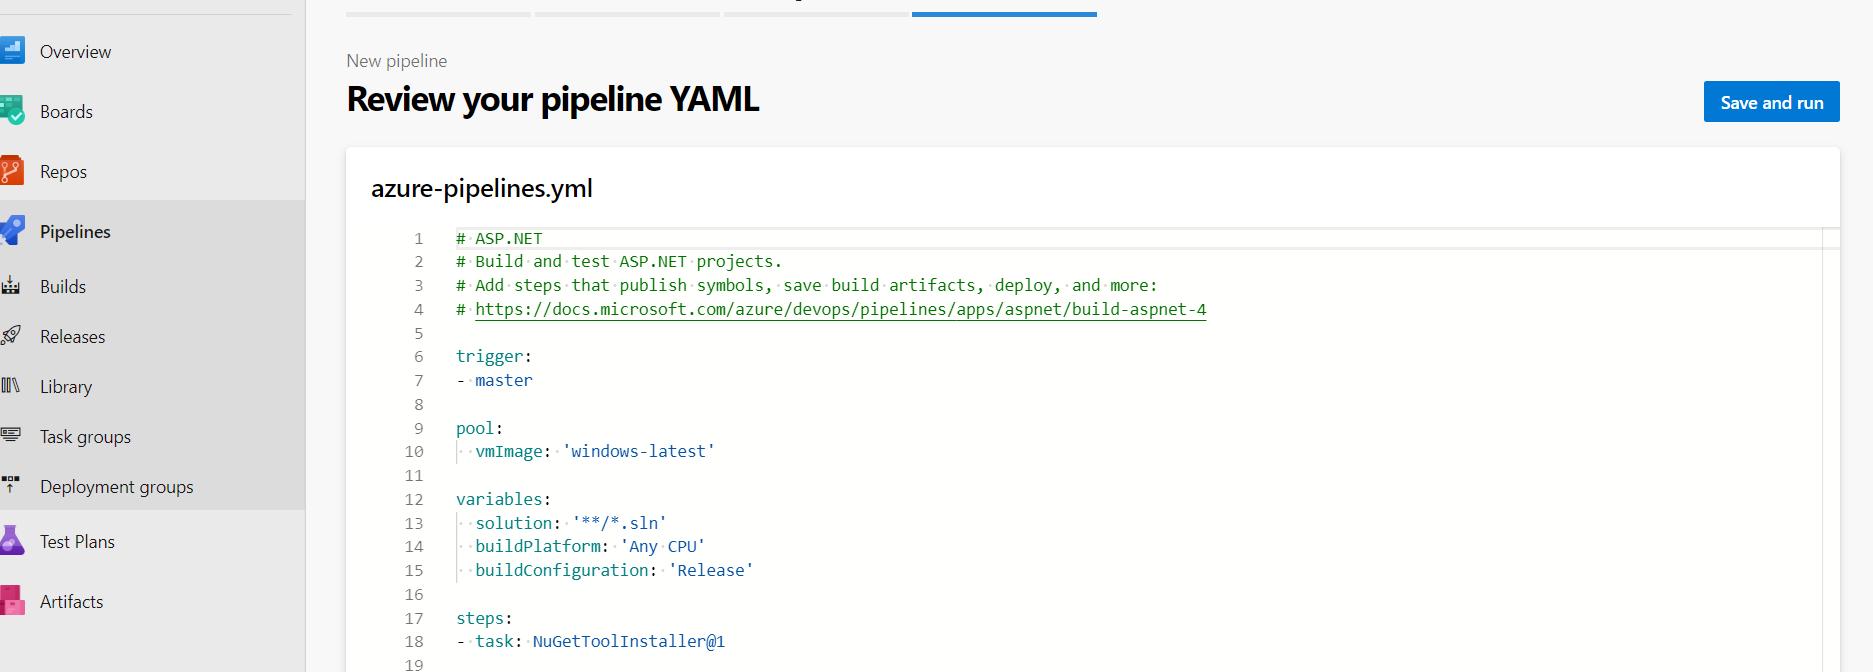 Review YAML Azure DevOps pipelines